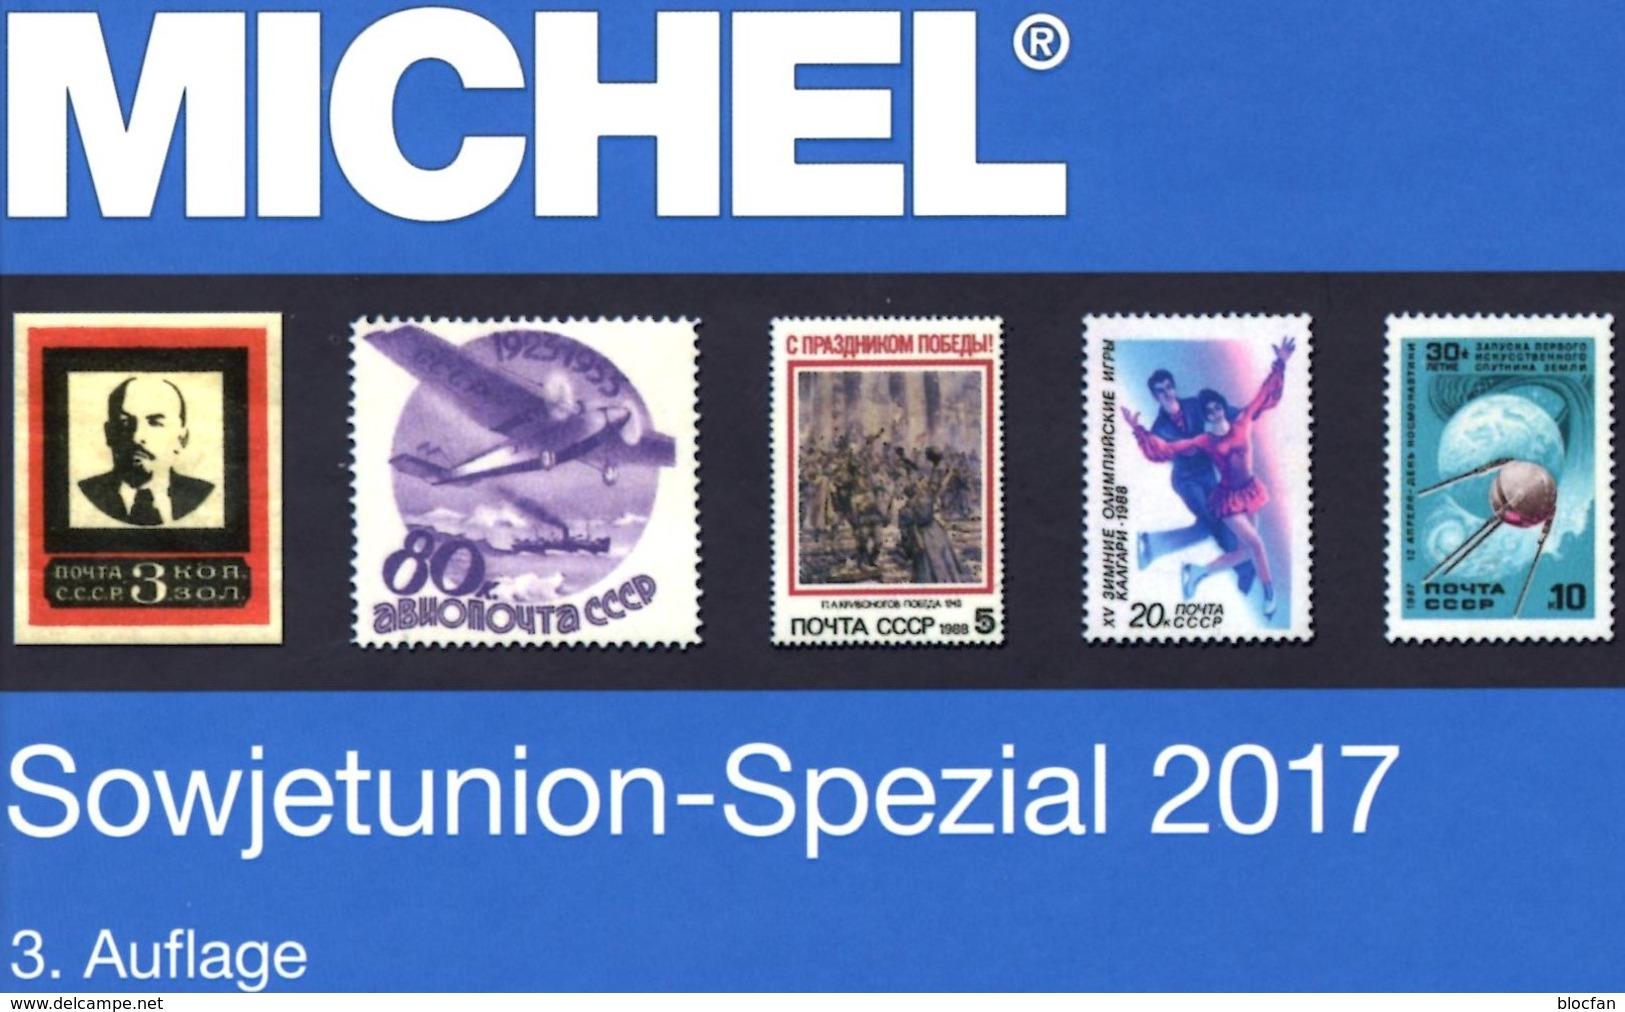 Sowjetunion Spezial Briefmarken Michel Katalog 2017 Neu 150€ Porto/Lokal/Gebühren-Marken Catalogues USSR CCCP SU - Books, Magazines, Comics